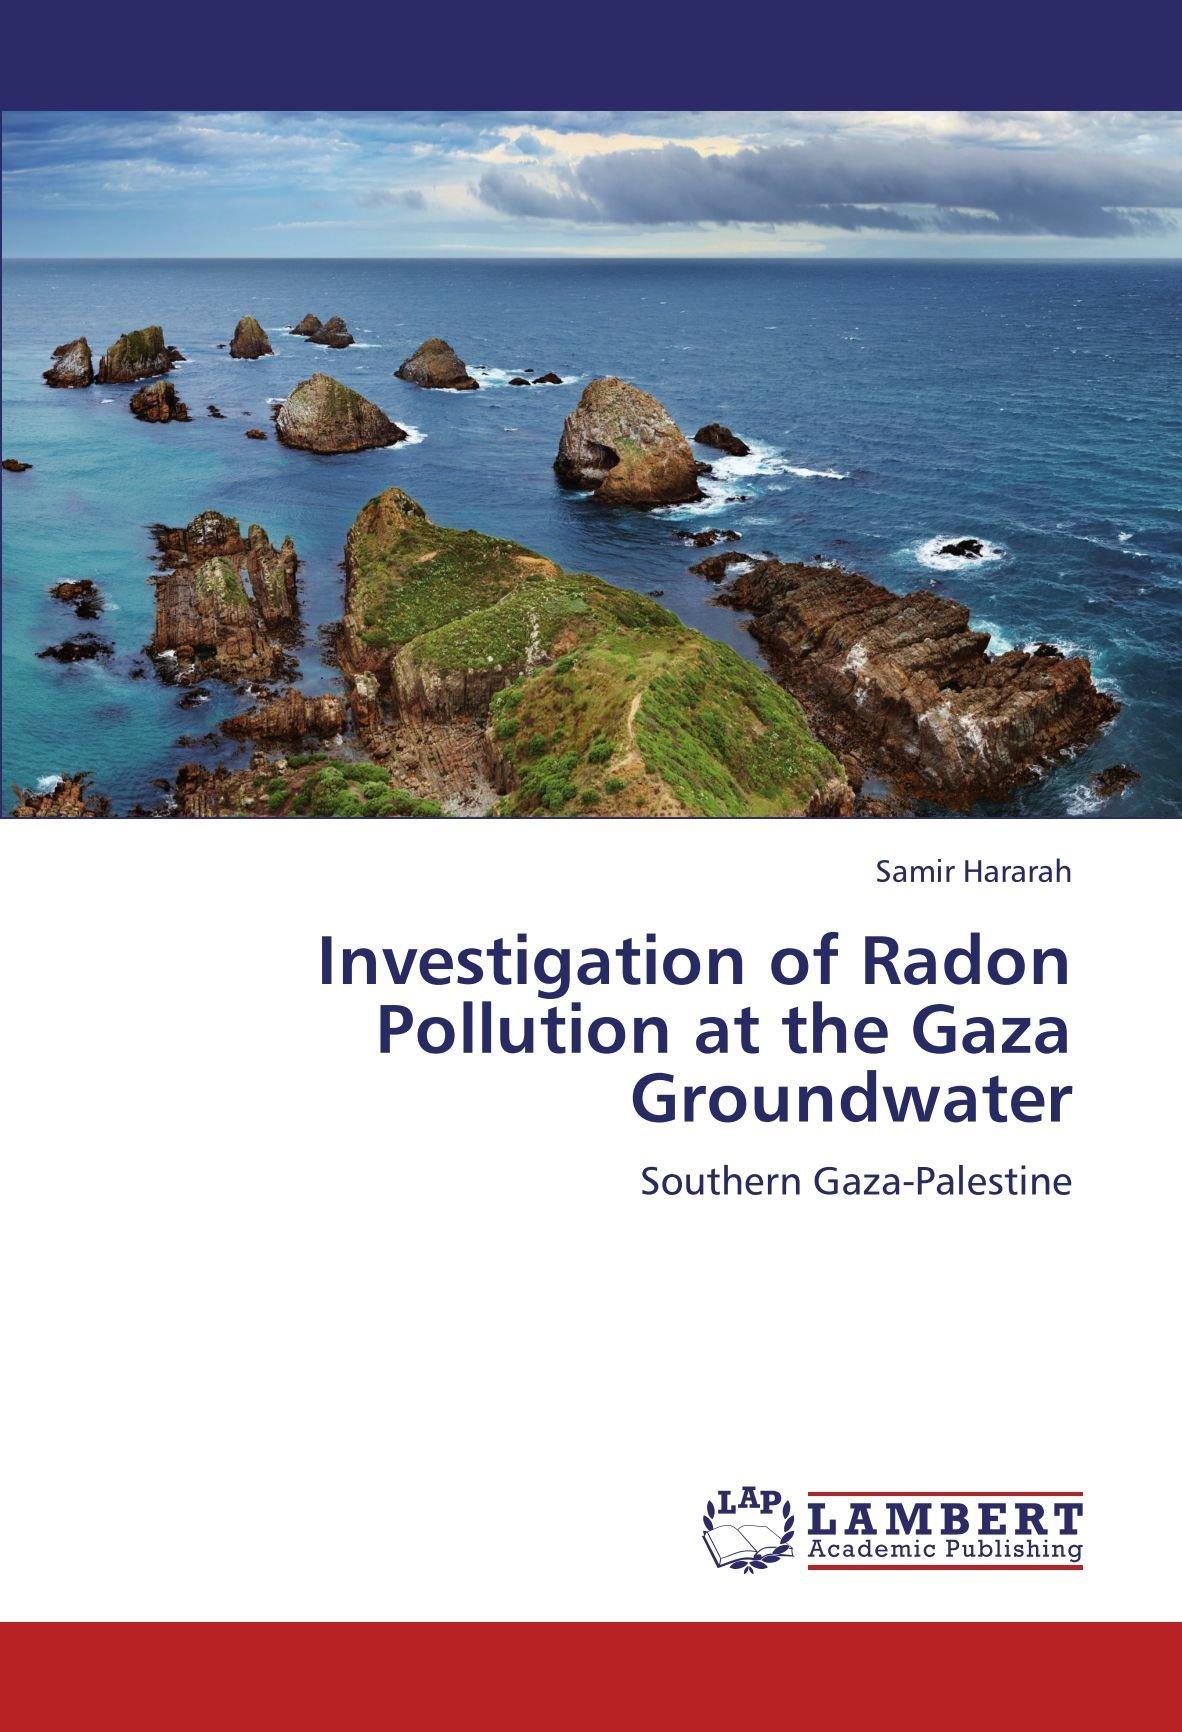 Download Investigation of Radon Pollution at the Gaza Groundwater: Southern Gaza-Palestine pdf